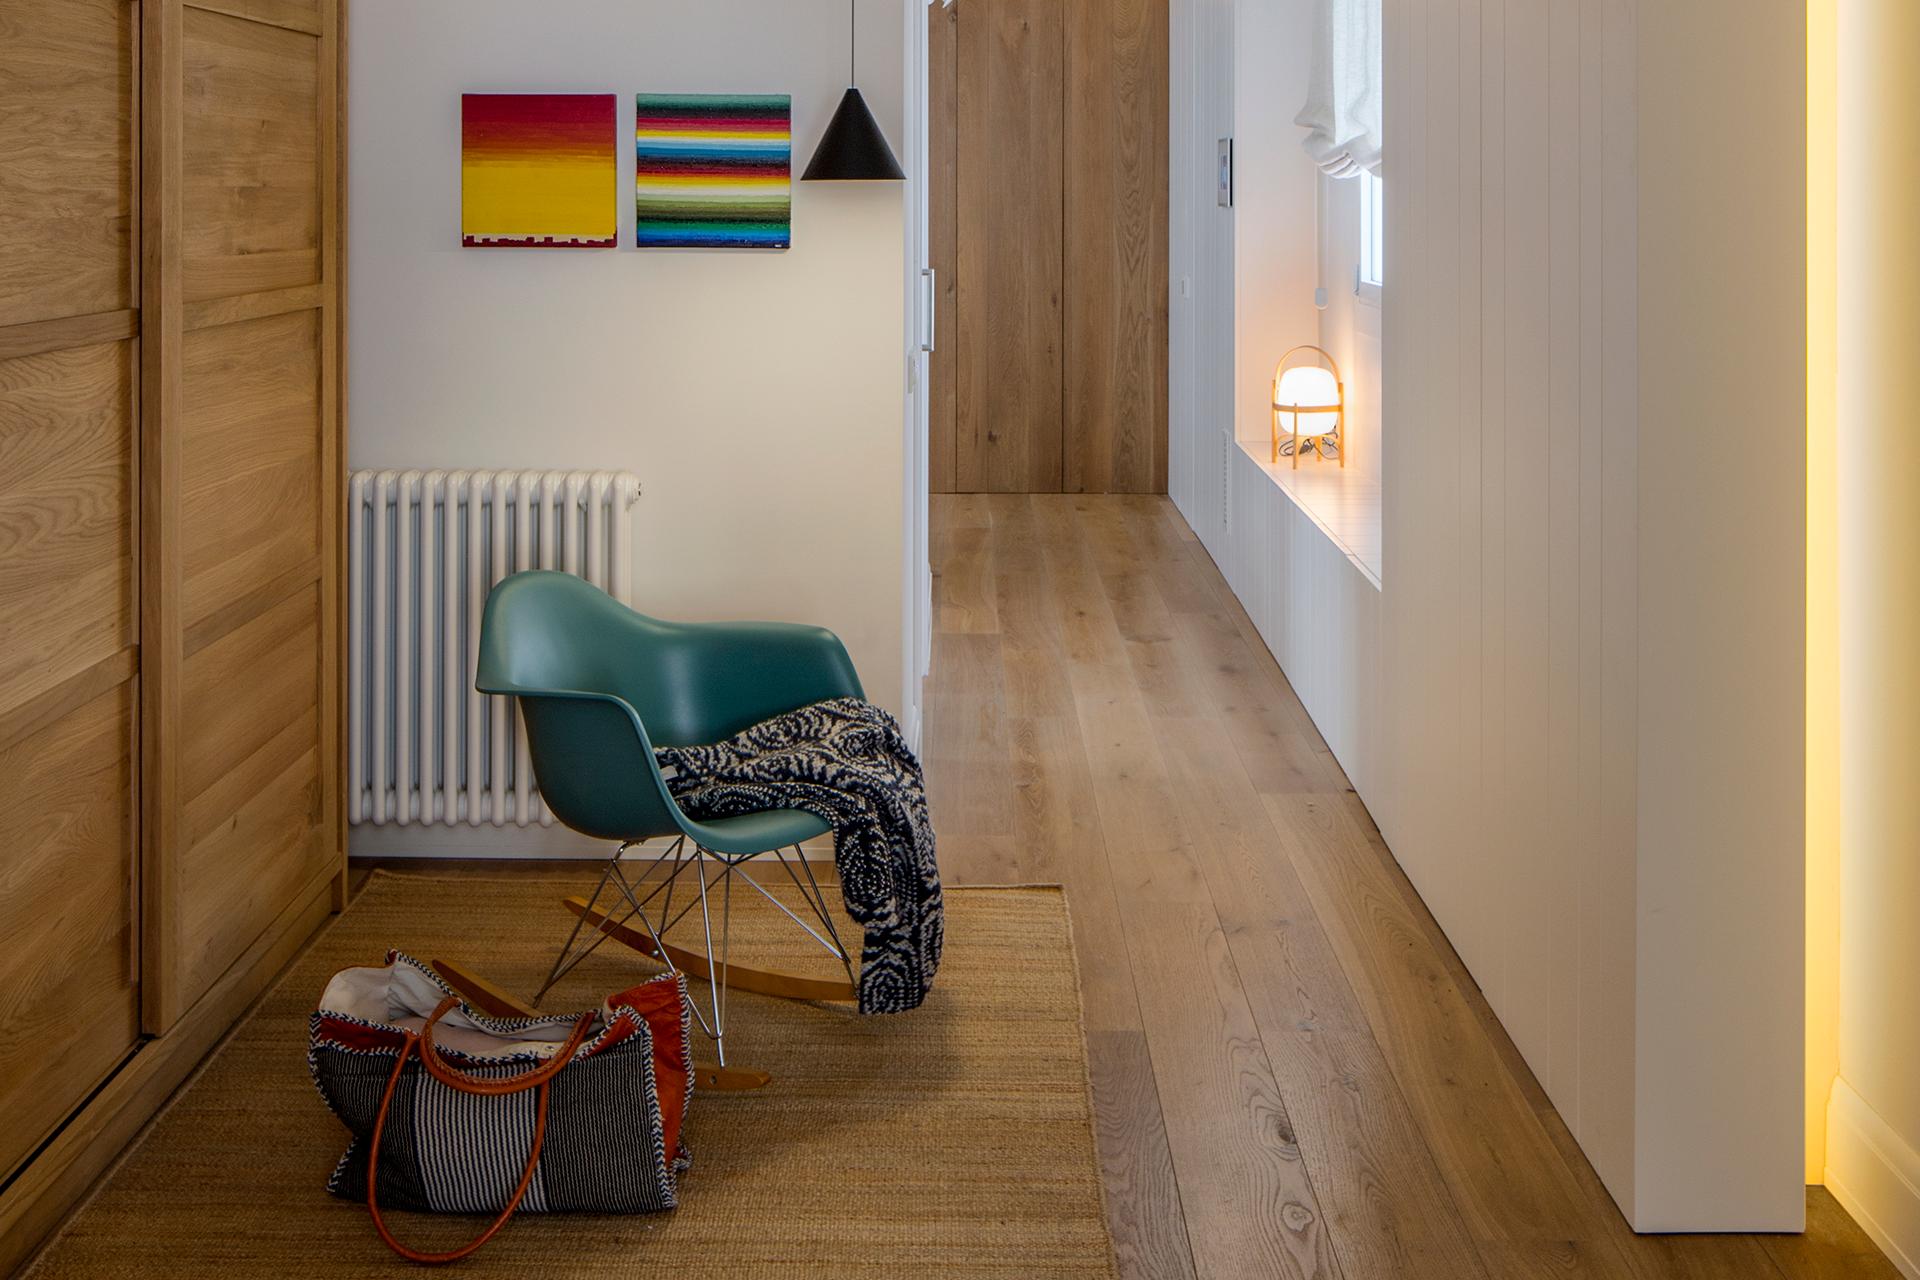 Interiorista Decorador | The Room Studio